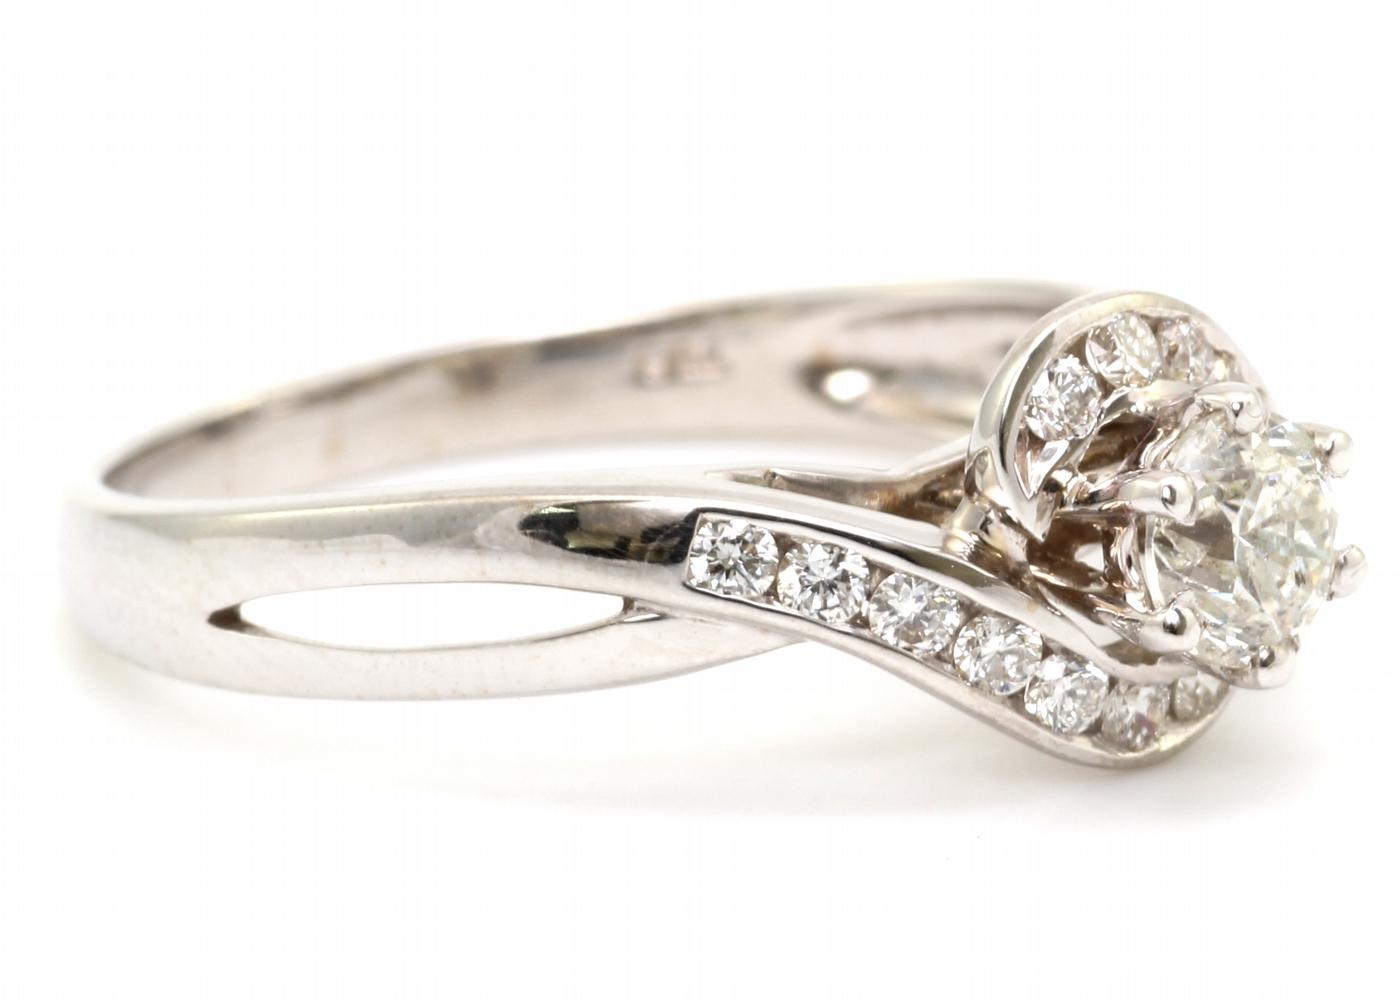 18ct White Gold Twist Diamond Ring 0.54 Carats - Image 4 of 4